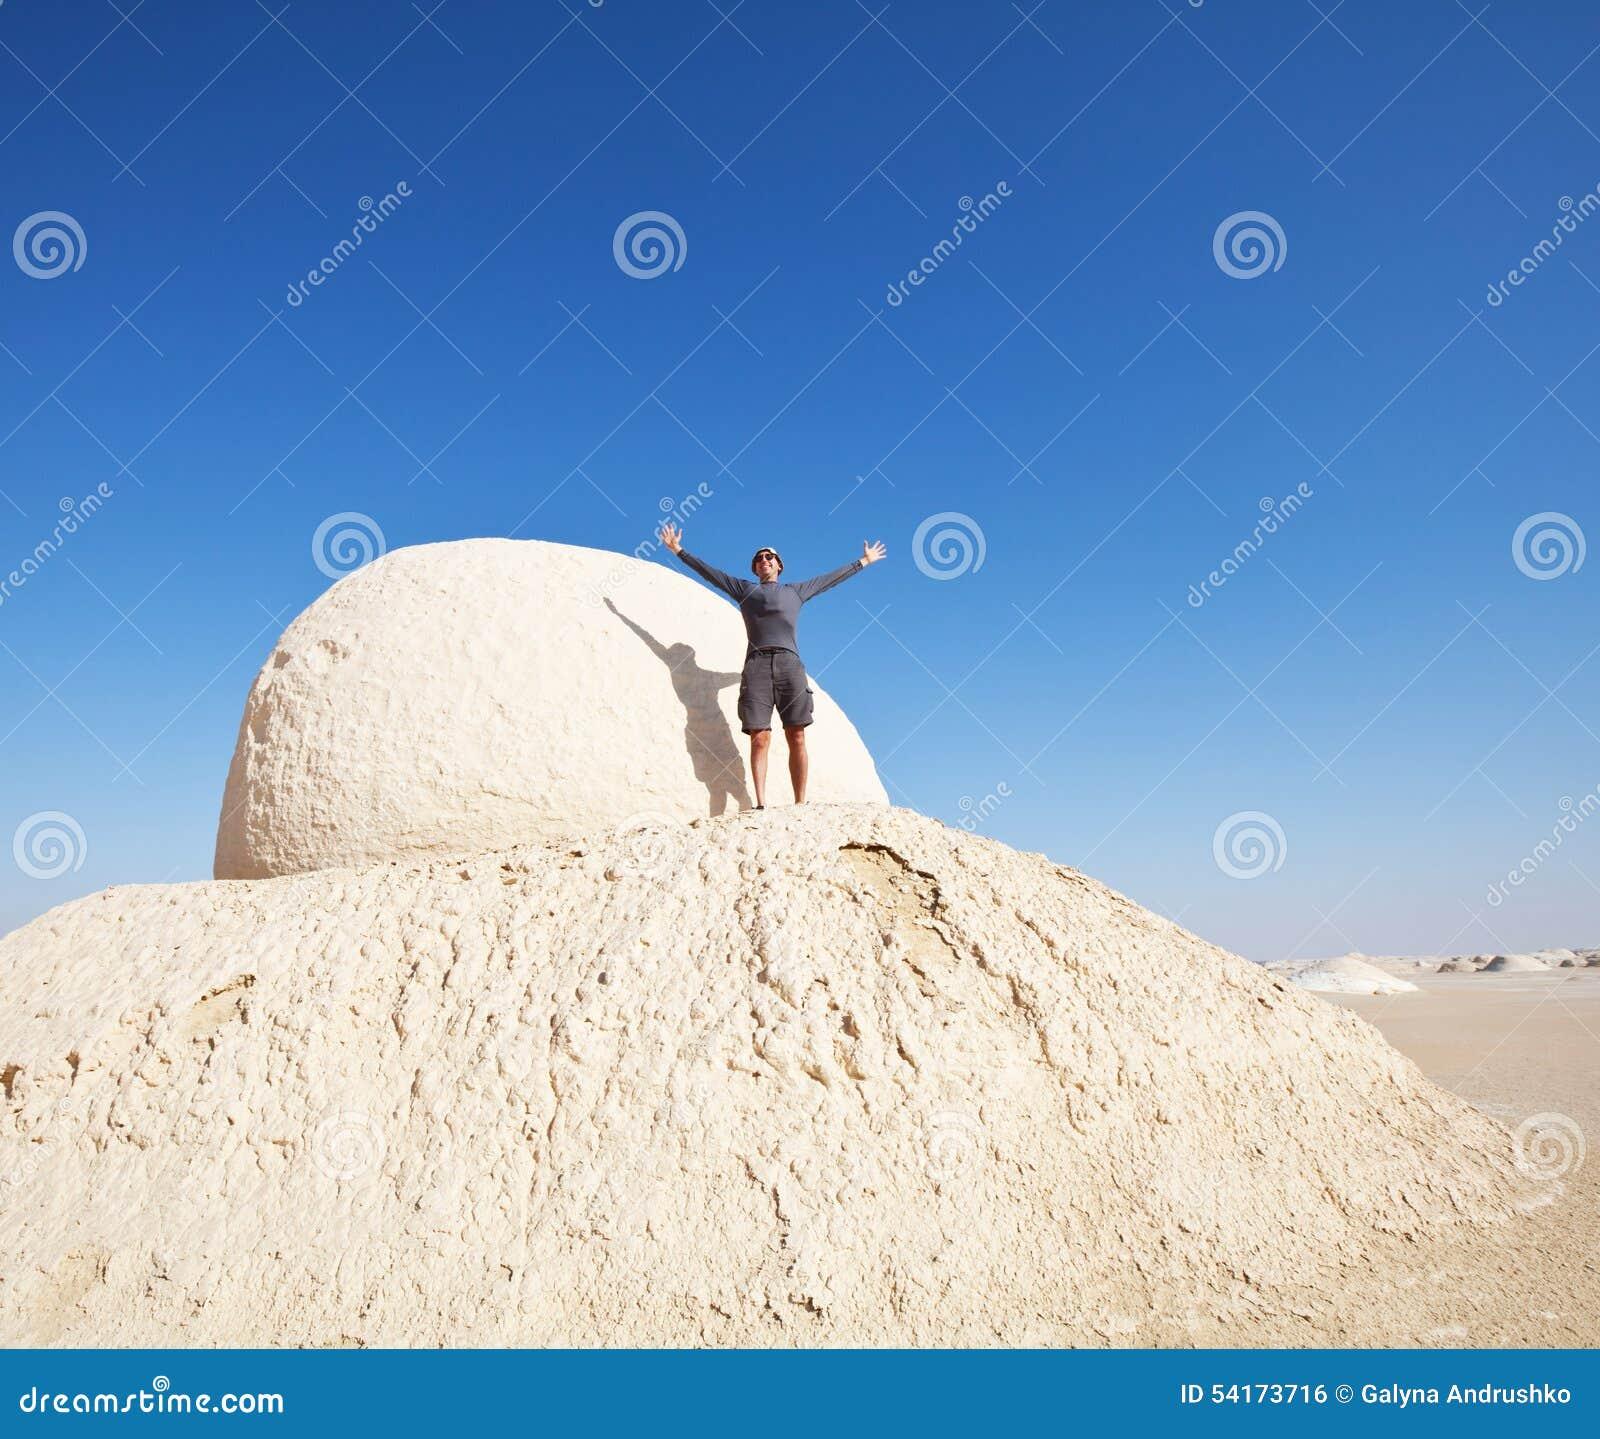 Stijging in Witte woestijn